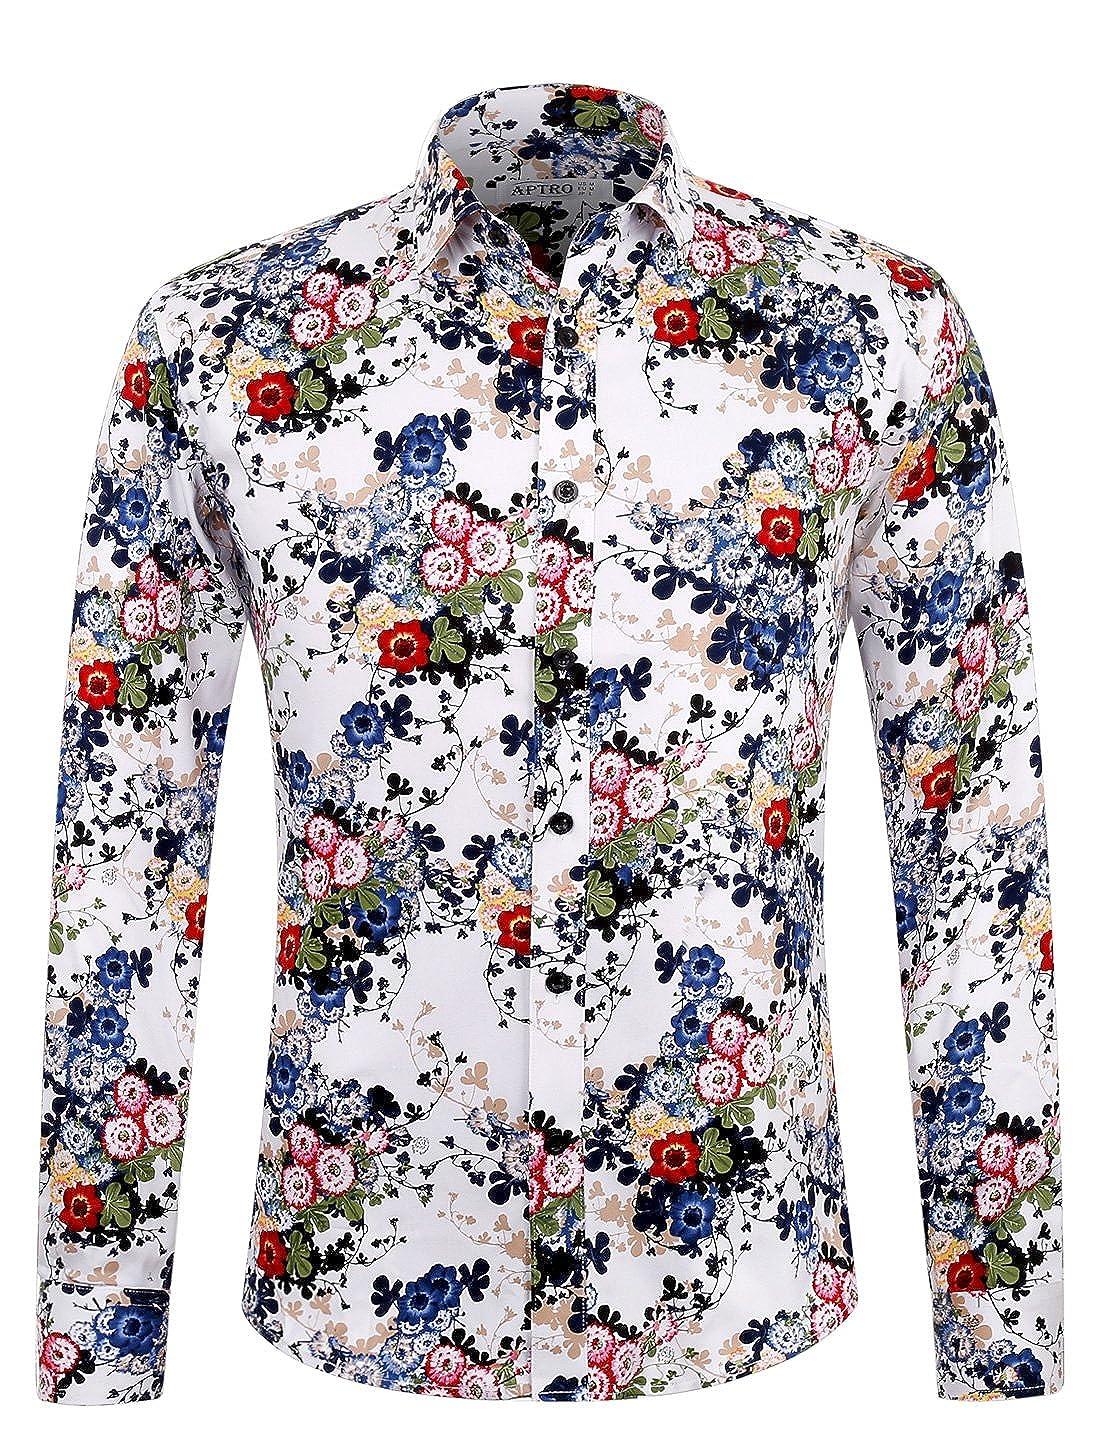 APTRO Men's Shirt Cotton Print Holiday Style Long Sleeve Floral Shirt